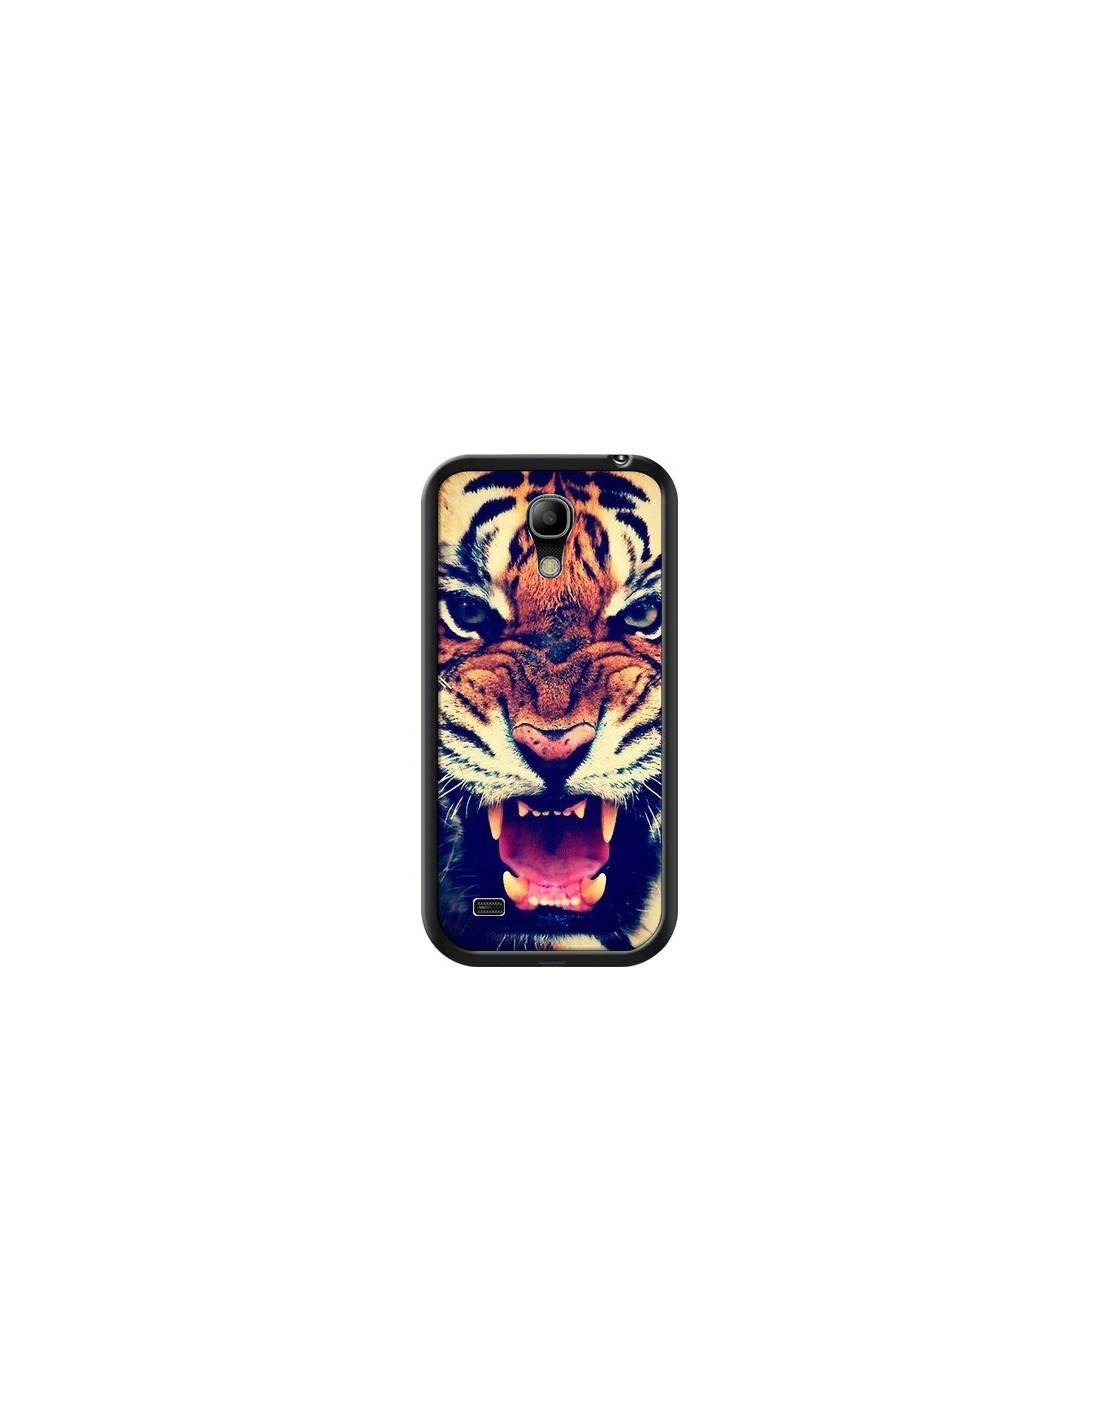 coque tigre swag roar tiger pour samsung galaxy s4 mini laetitia. Black Bedroom Furniture Sets. Home Design Ideas